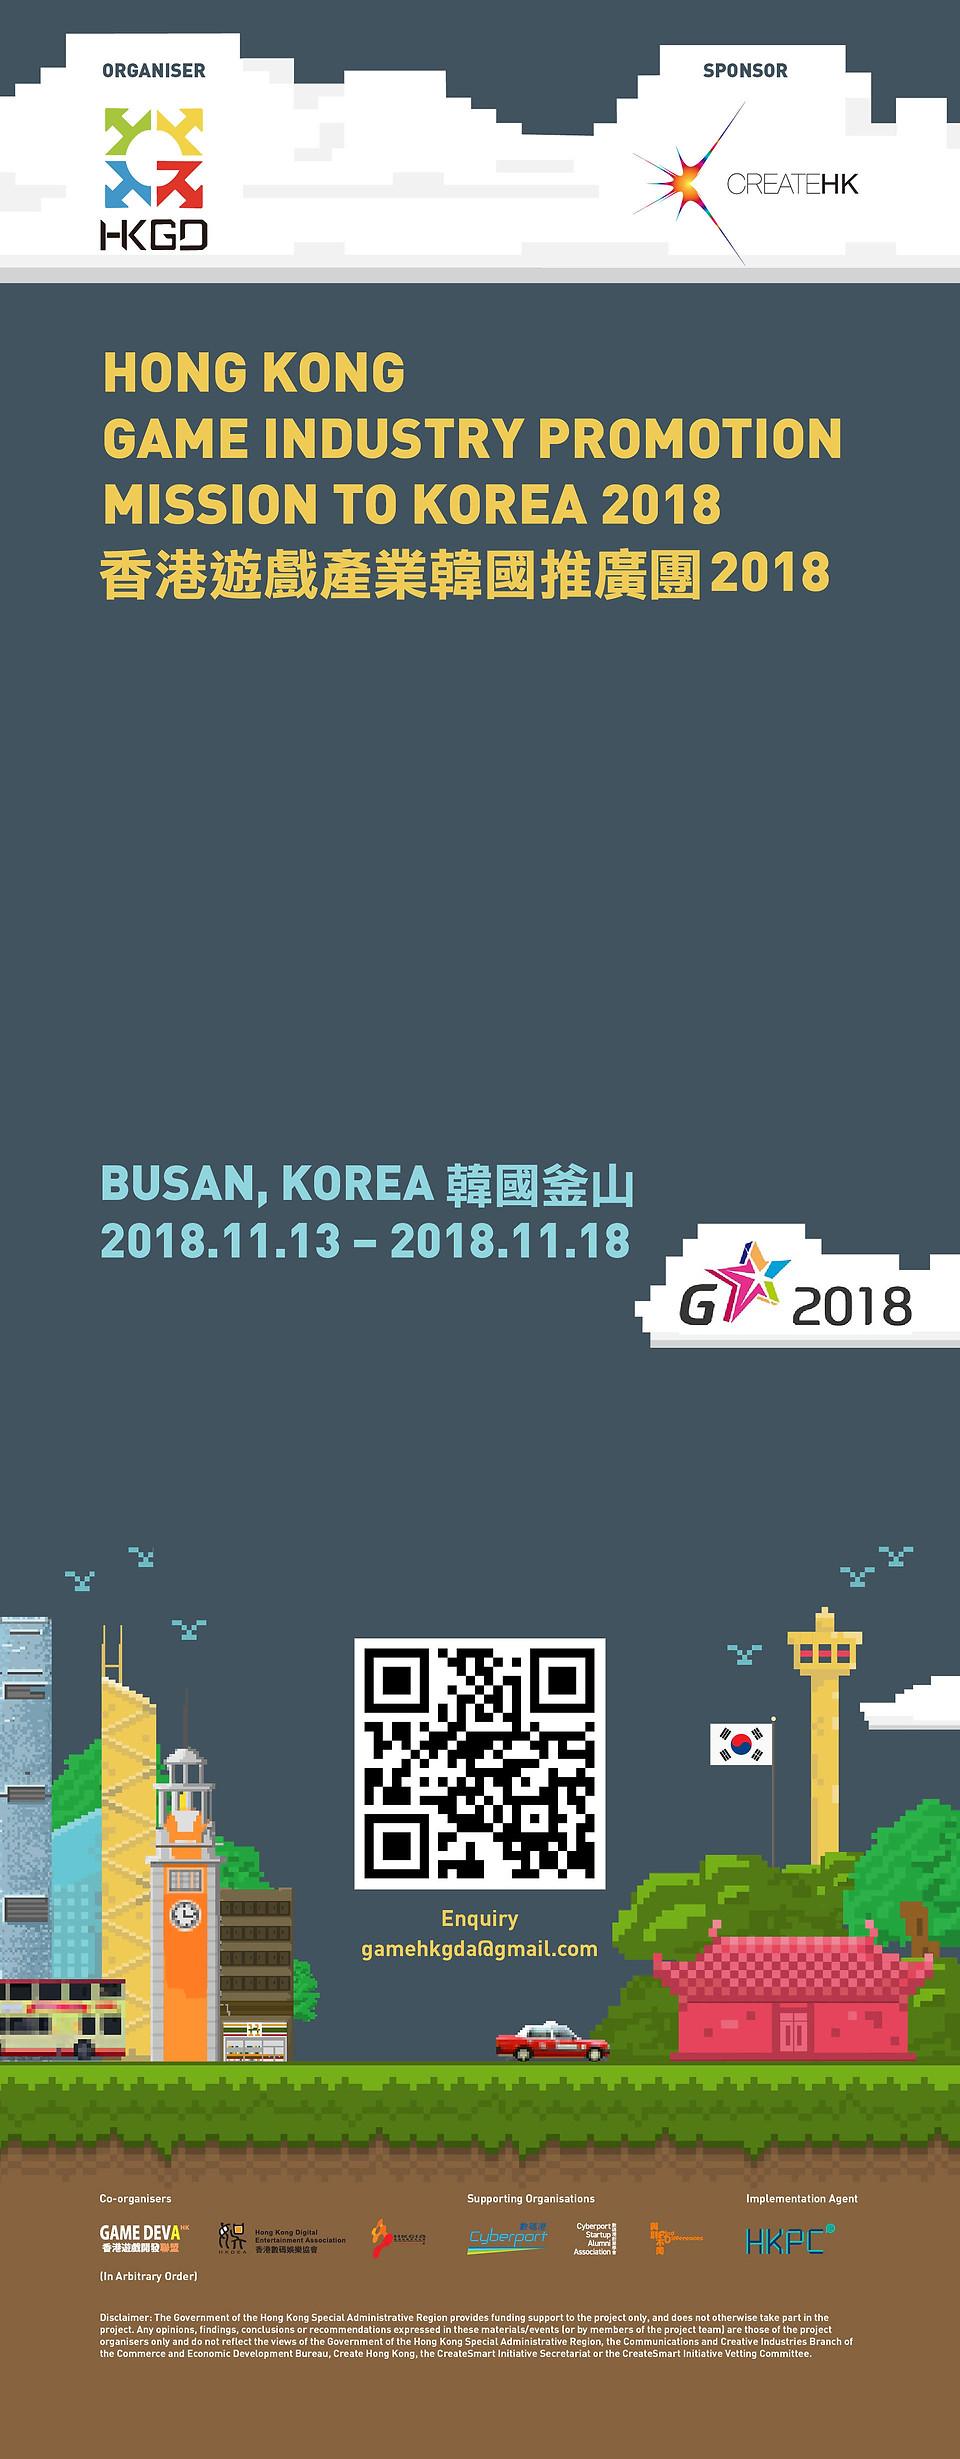 20181115_HKGDA_compressed.jpg